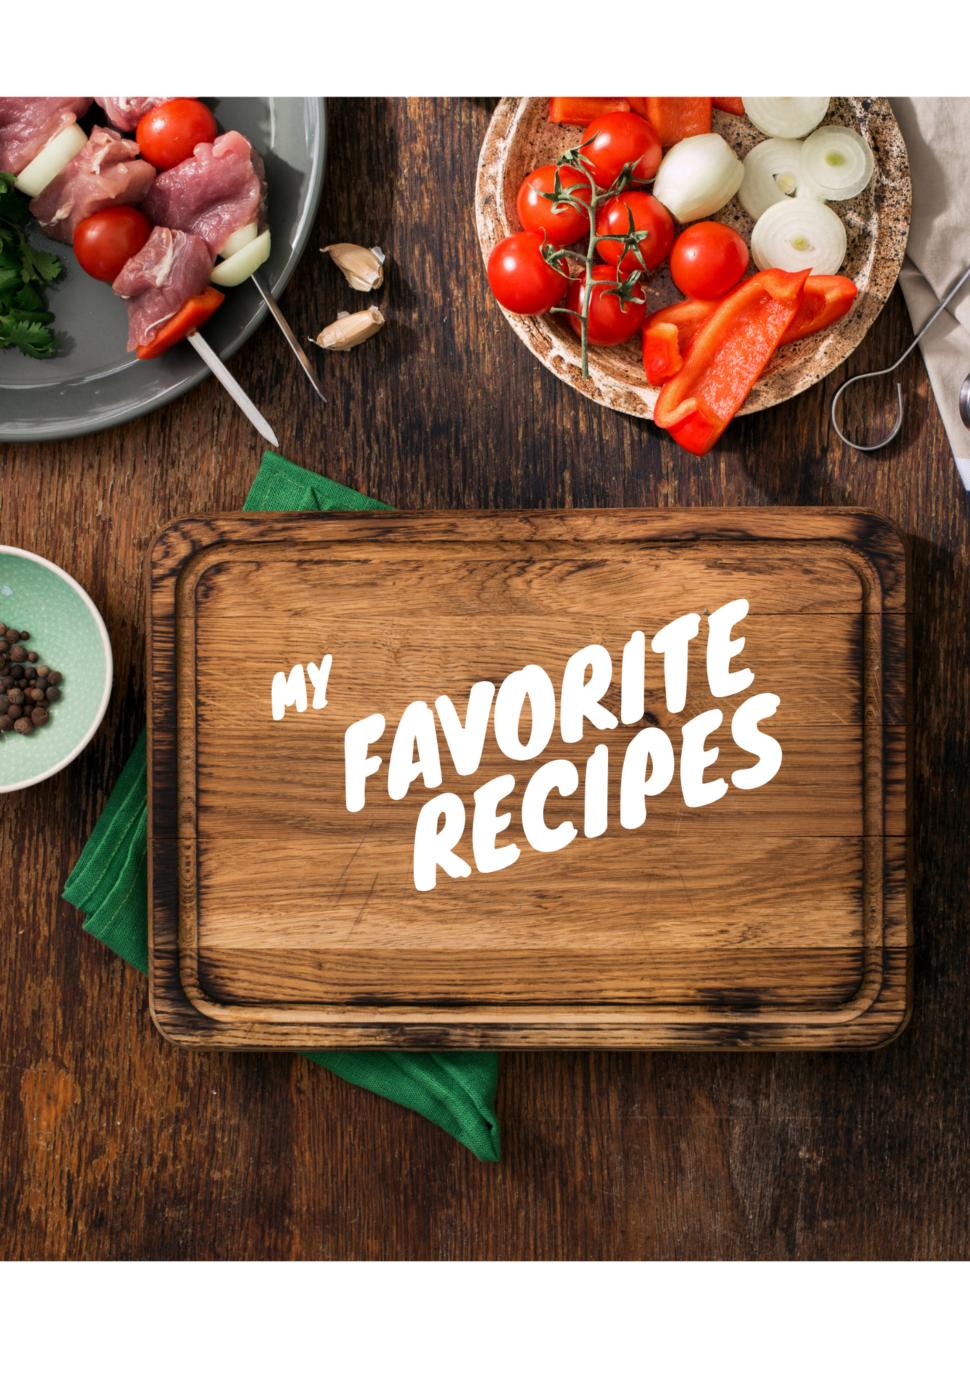 Recipes blank book